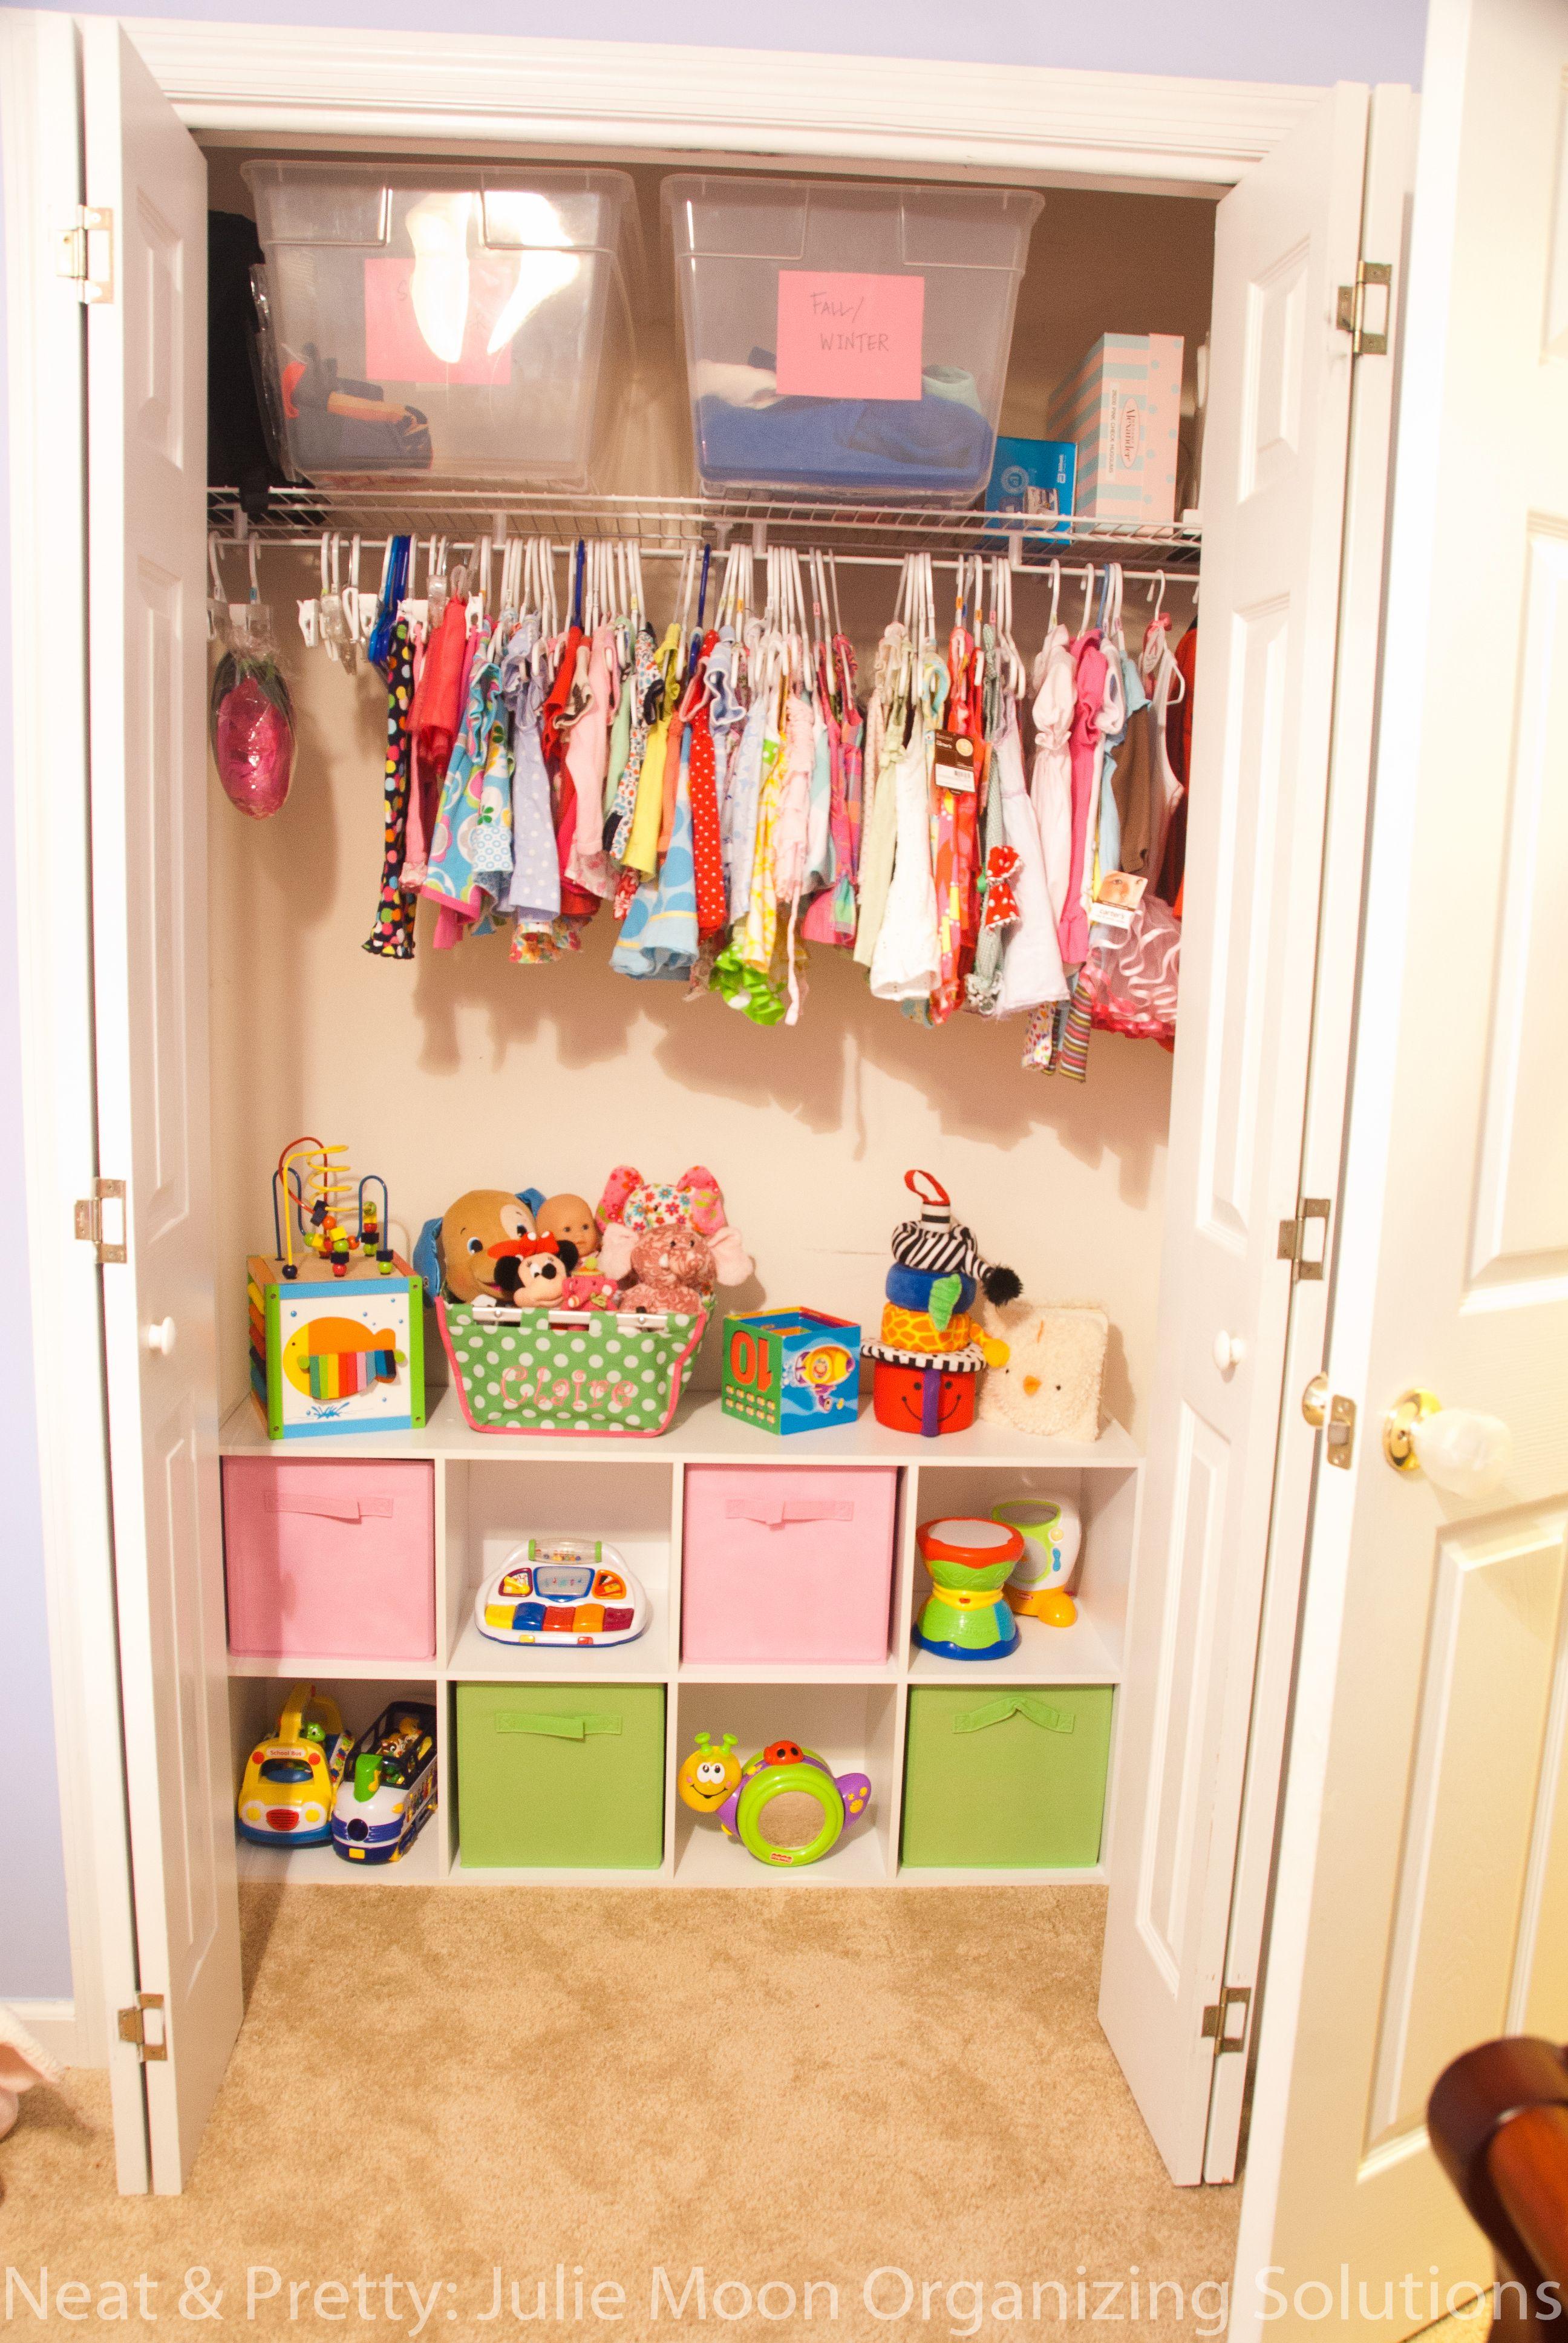 armoire inspirational wardrobe storage wardrobes ideas childrens of kids solutions closet best